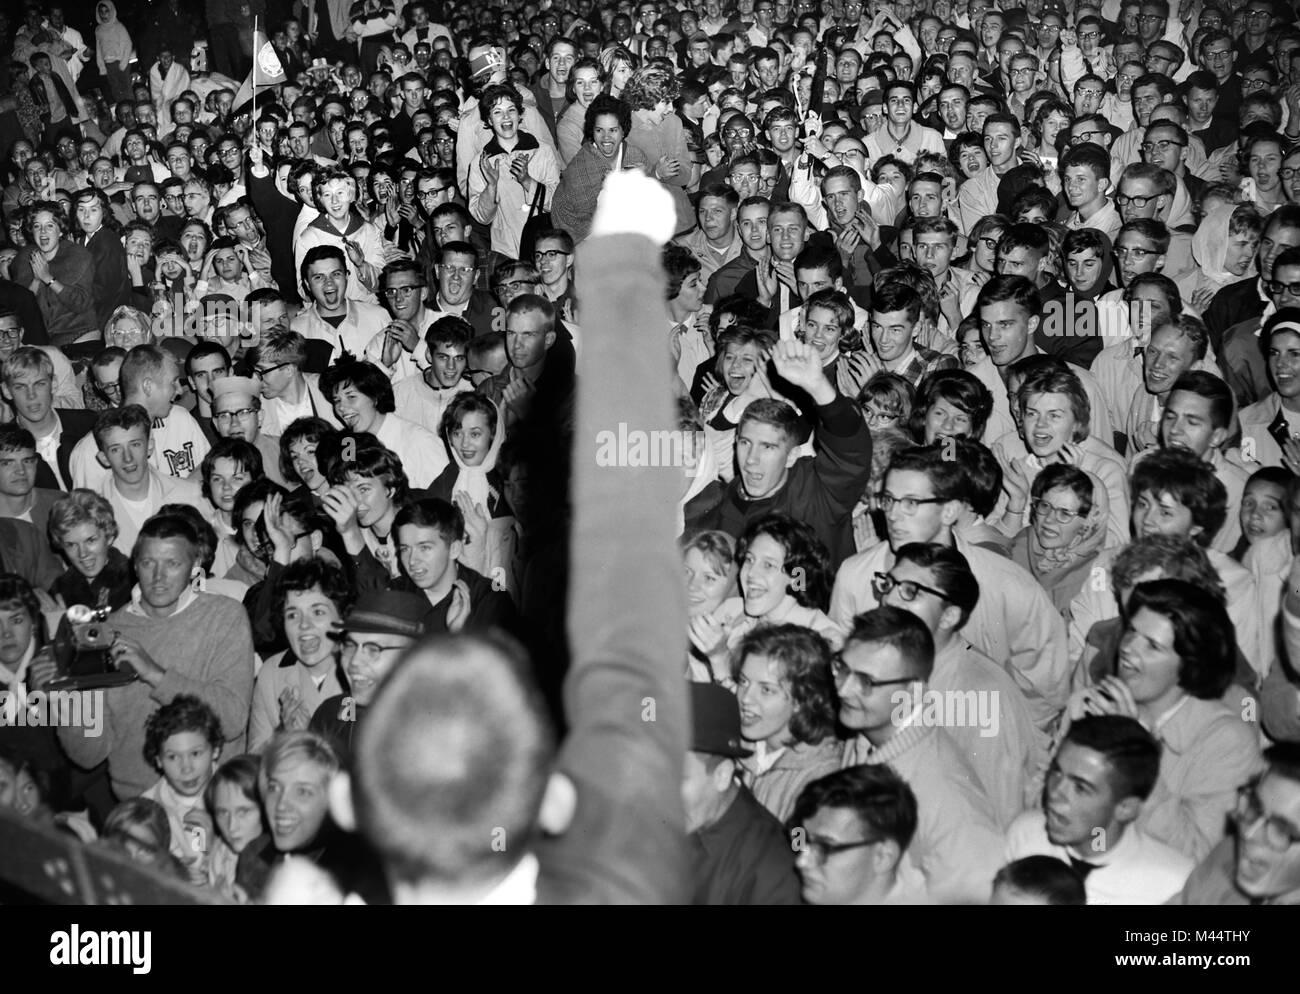 Football game pep rally at Northwestern University, ca. 1962. - Stock Image